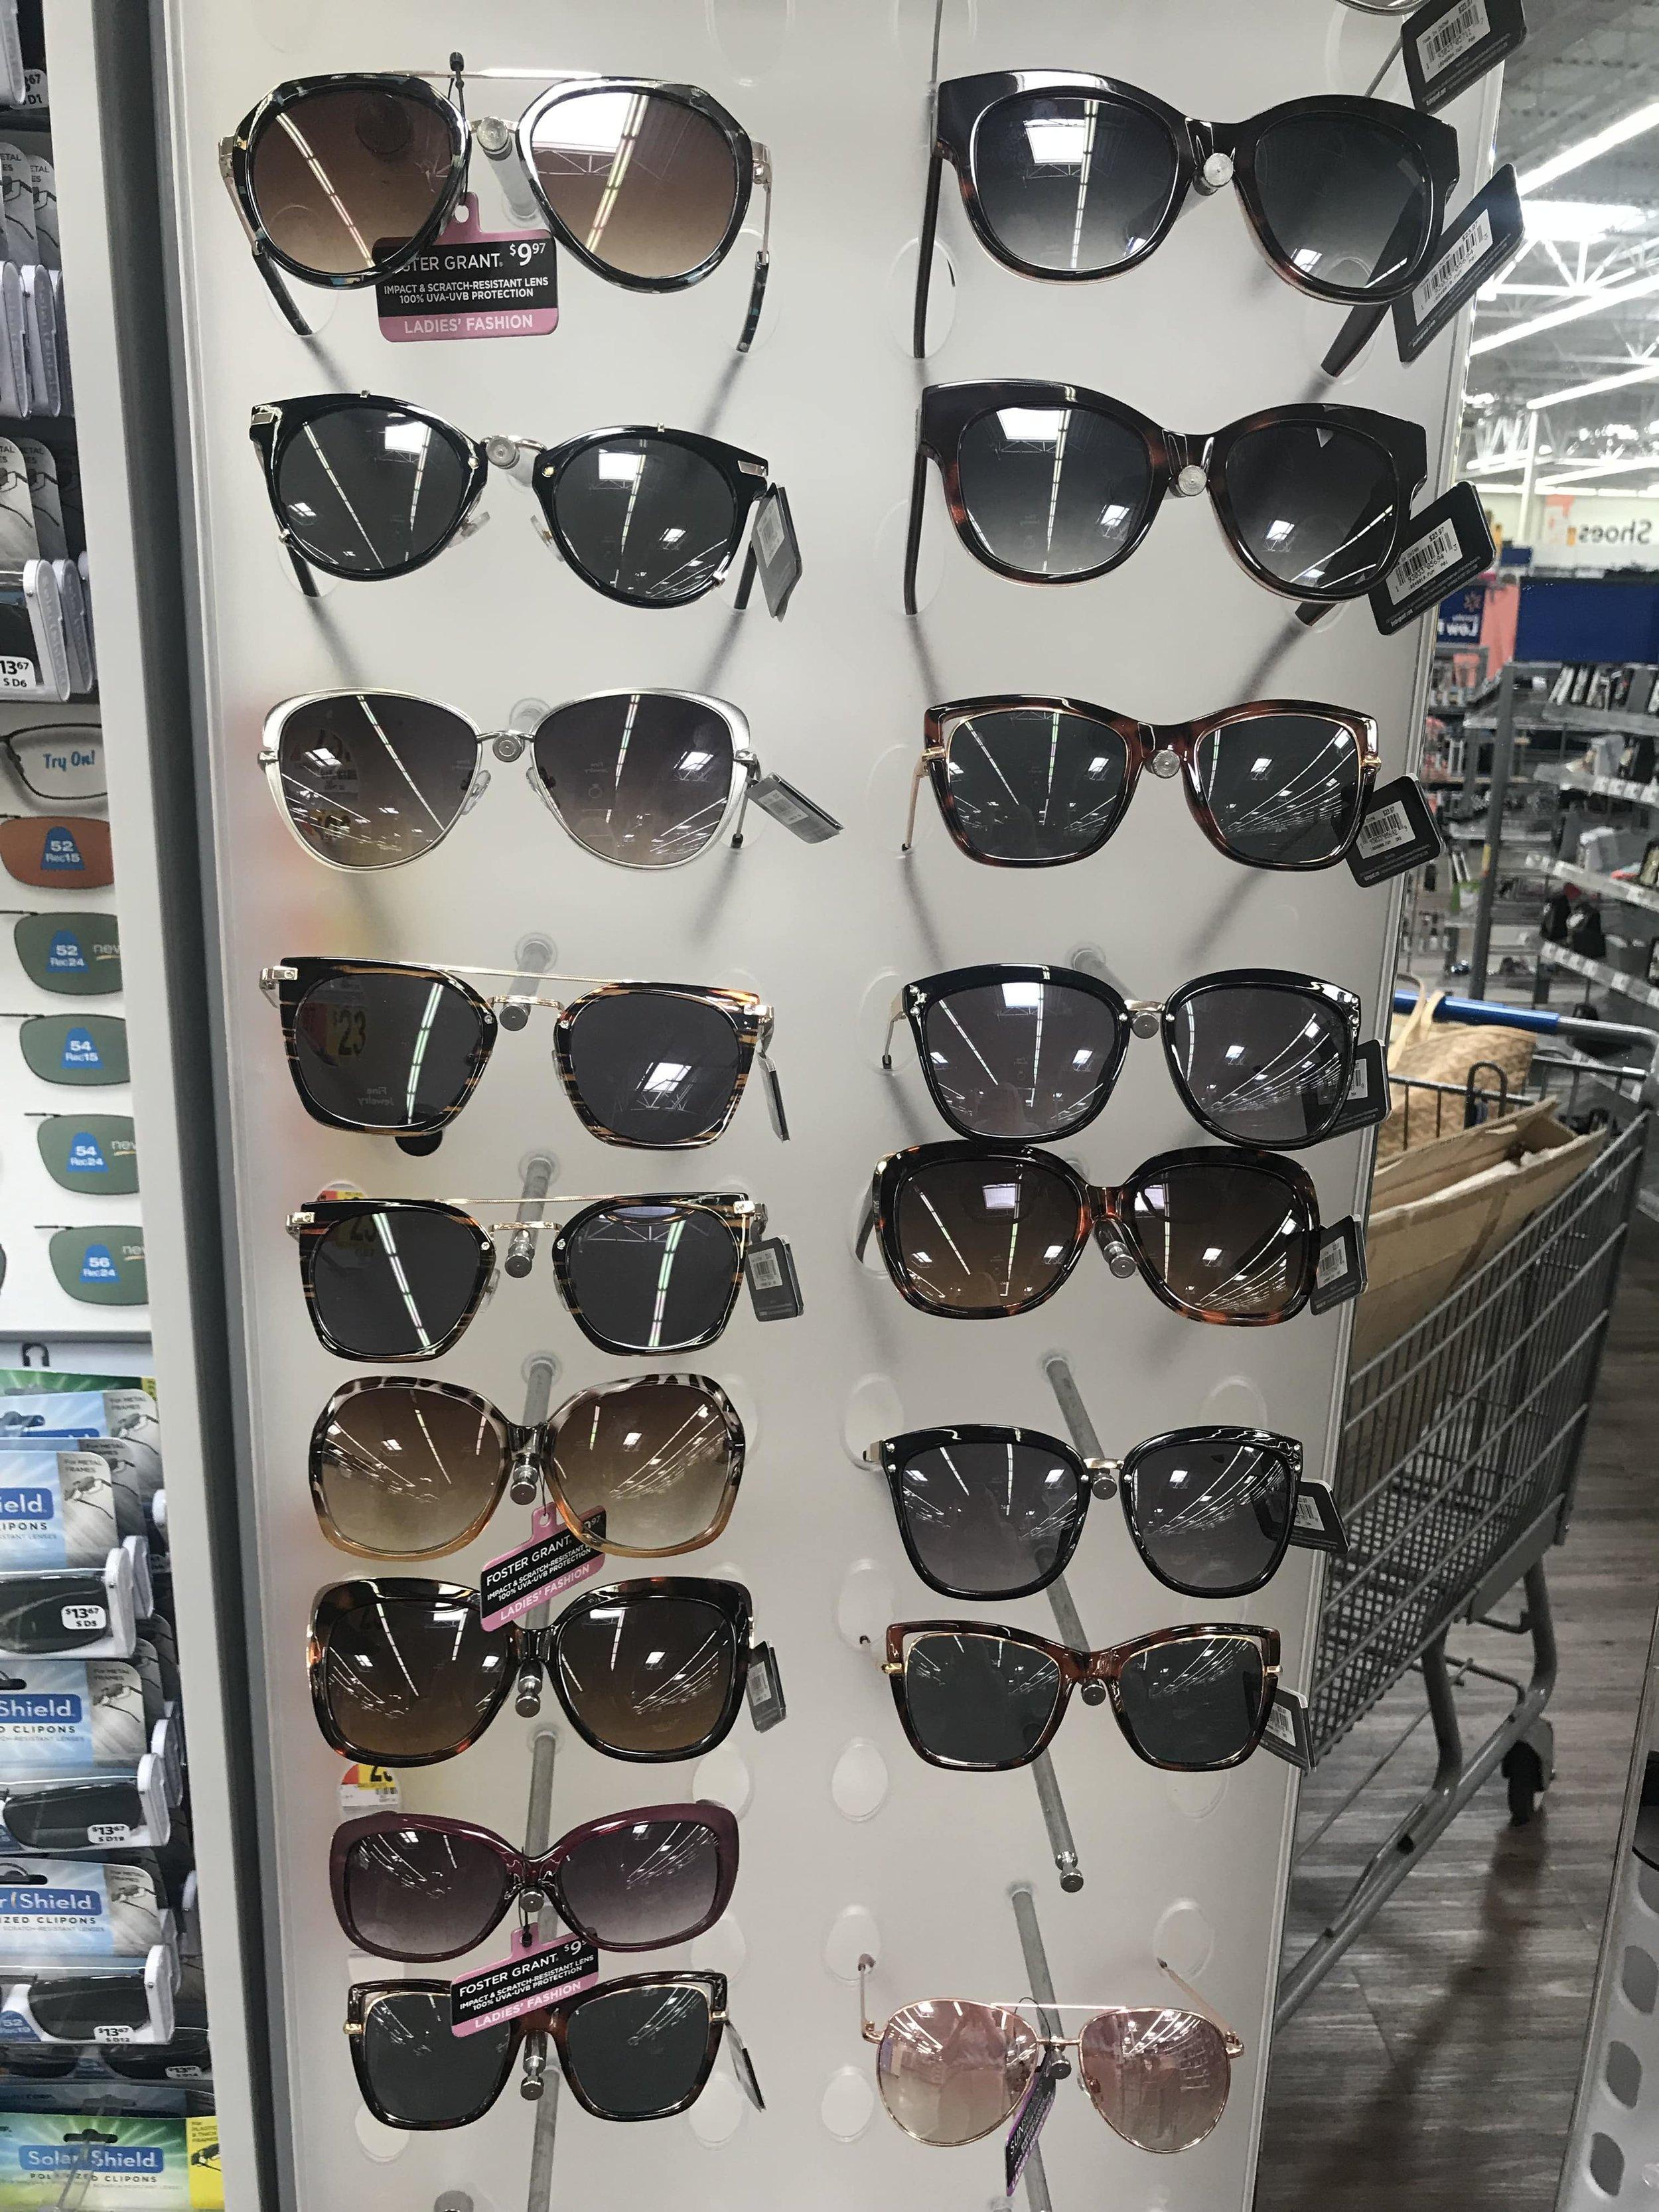 Walmart-Foster-Grant-sunglasses-rack-min.jpg